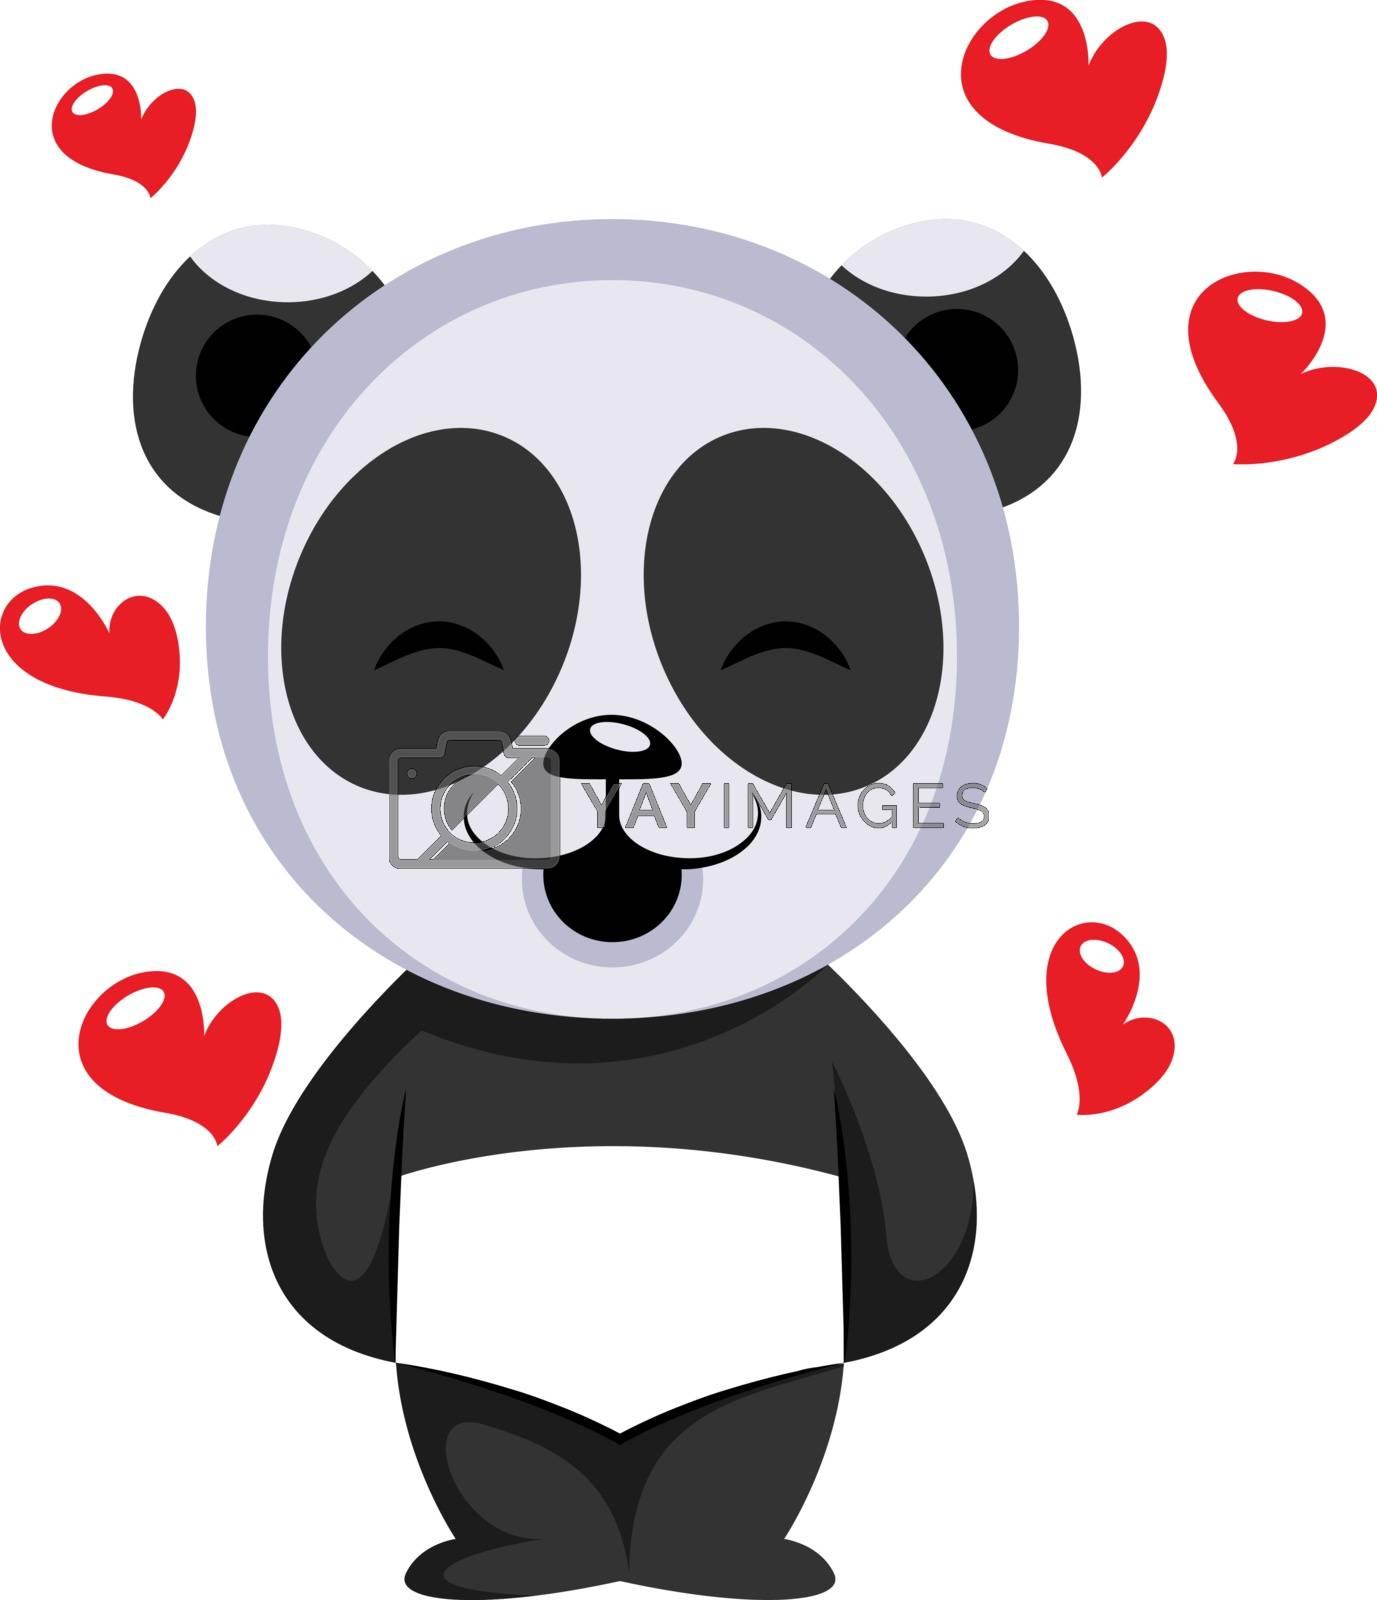 Royalty free image of Little panda bear in love illustration vector on white backgroun by Morphart